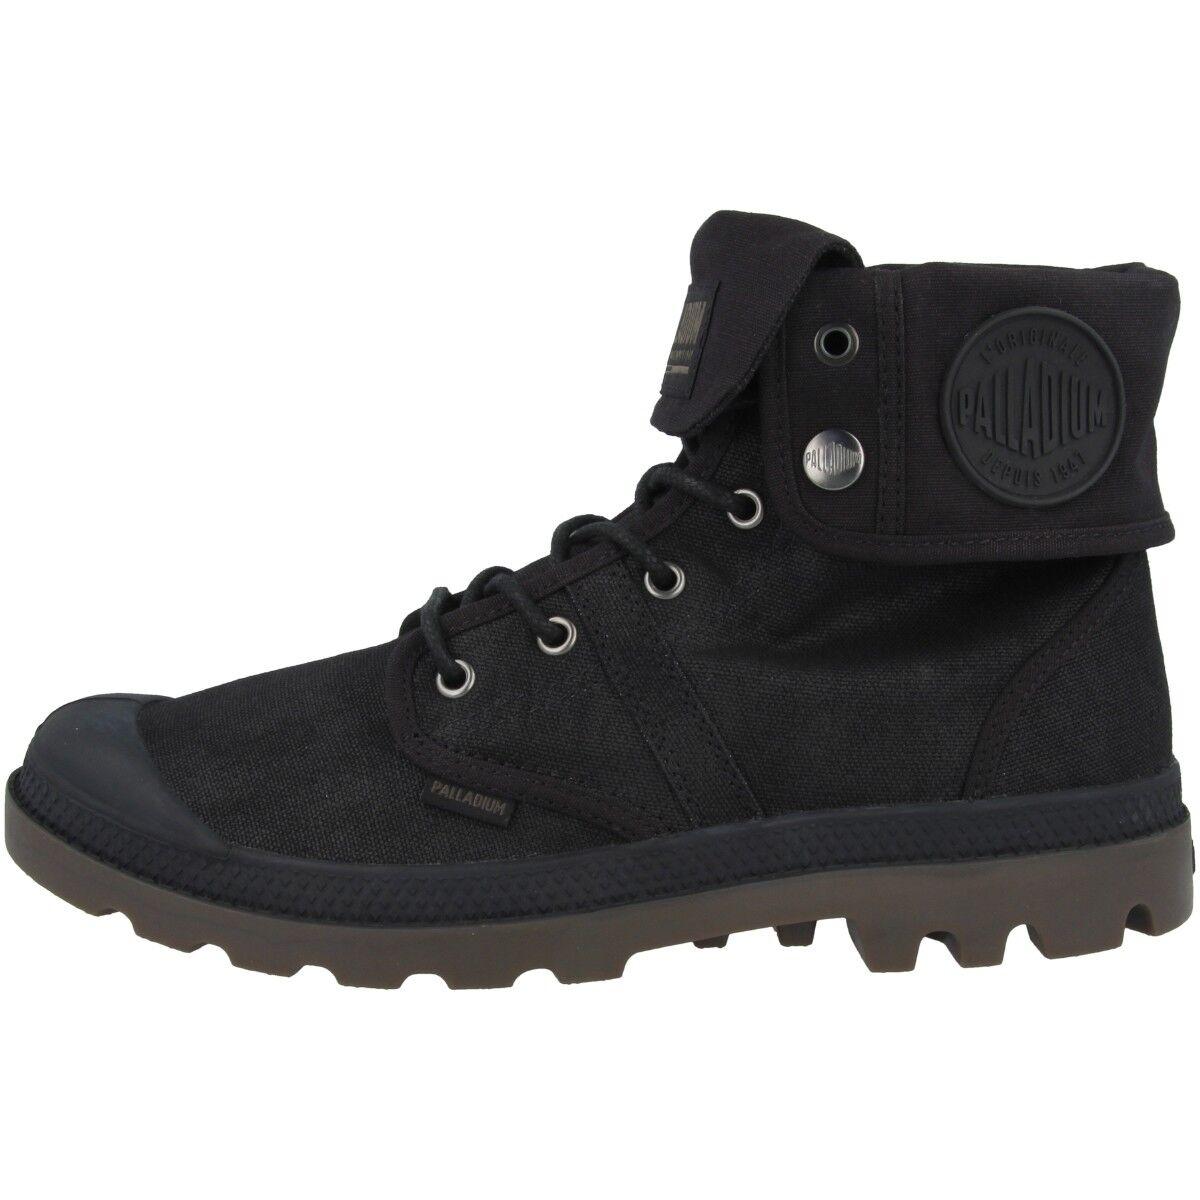 Palladium Pallabrousse Baggy Wax Stiefel Schuhe High Top Sneaker Stiefel 75534-046